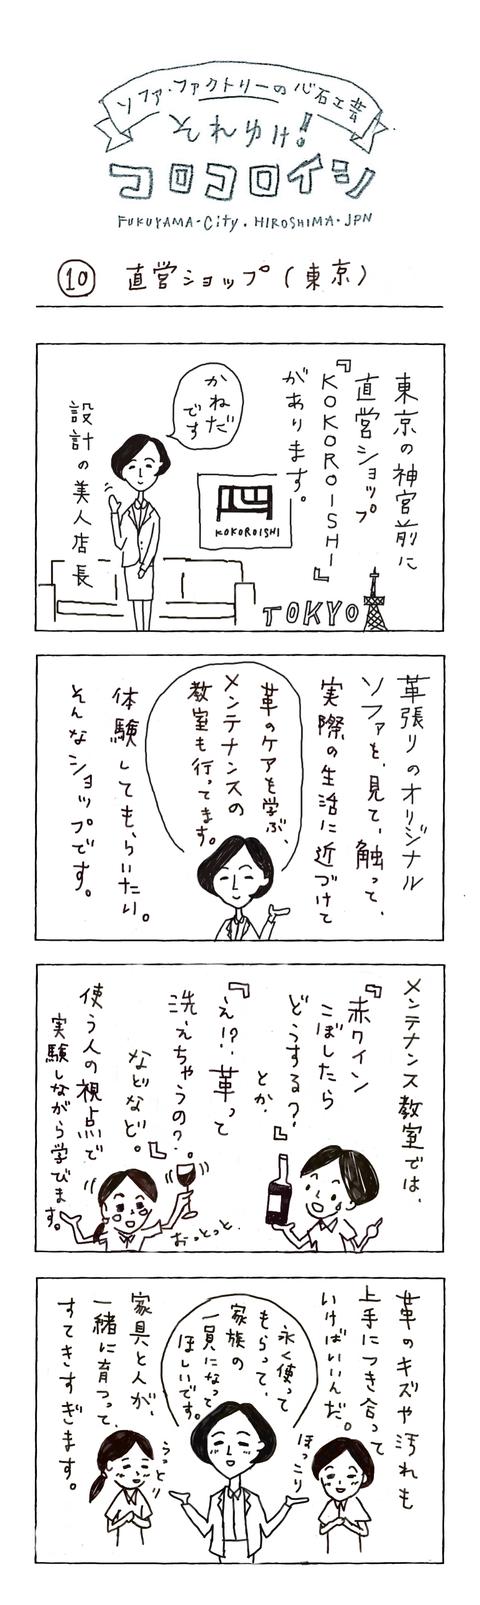 10t直営ショップ修正